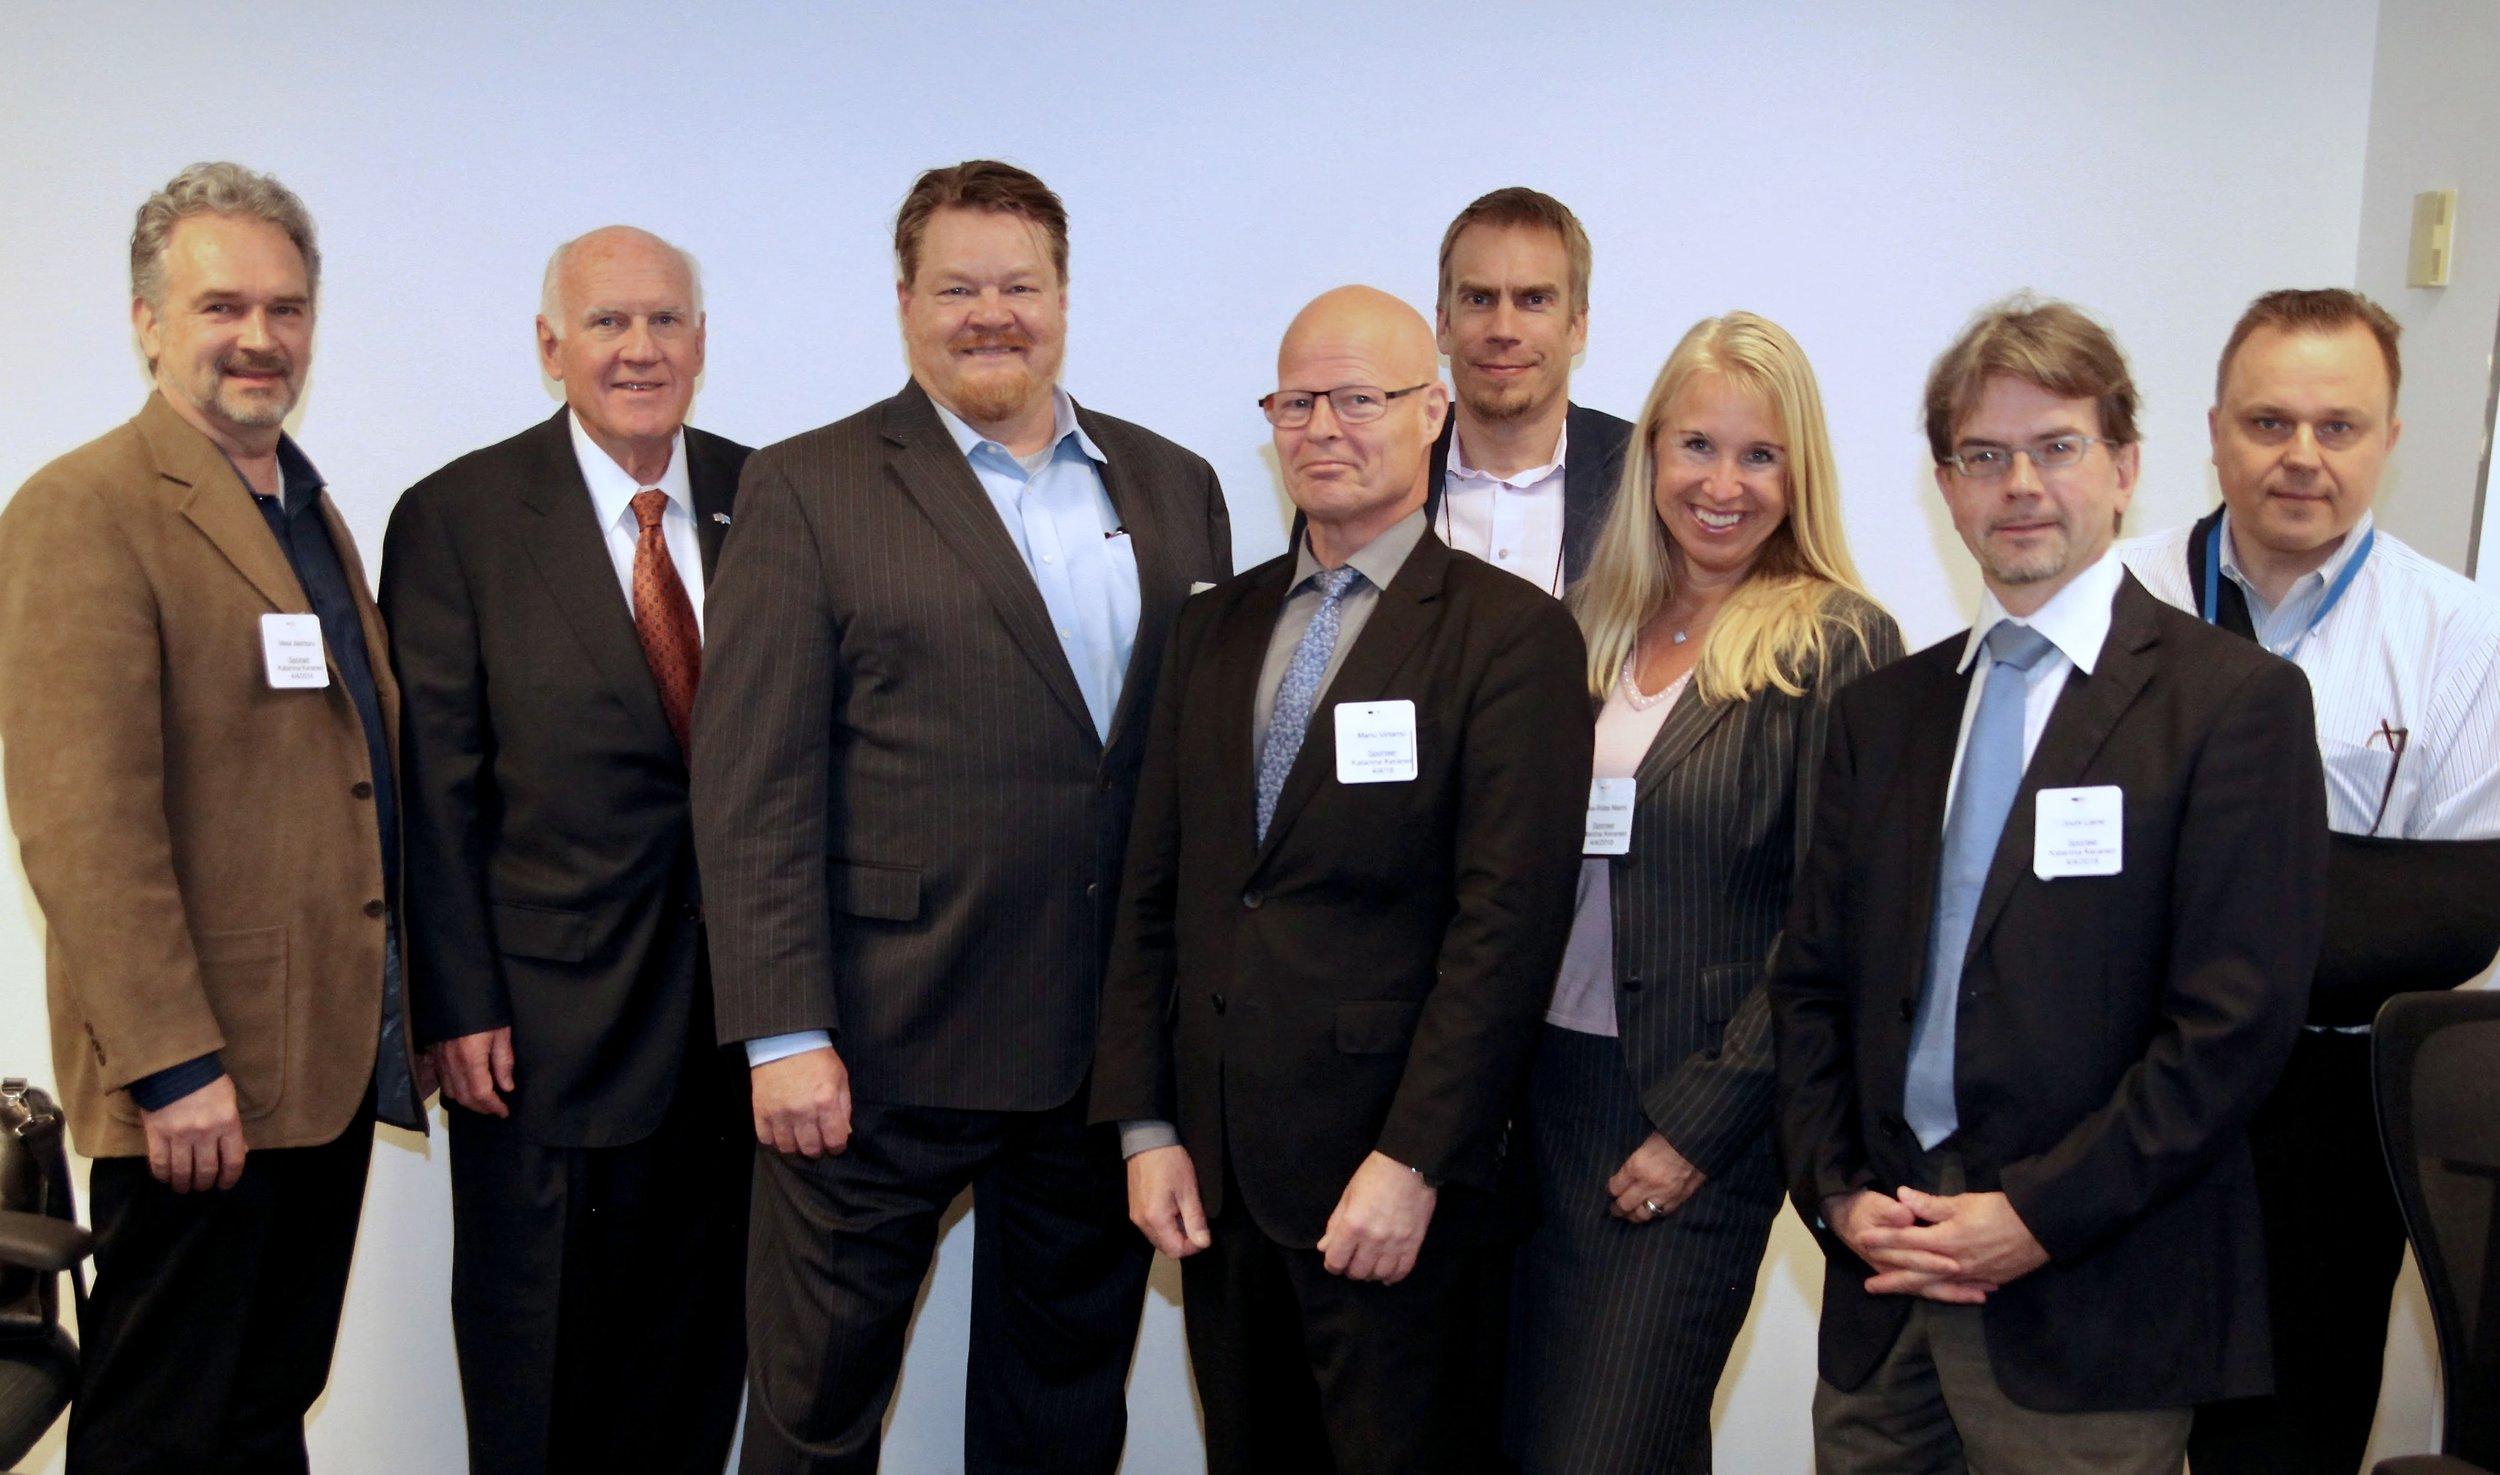 HE CG Manu Virtamo (in the middle) with the FABG Board of Directors - (from left) Chairman Vesa Jäämuru, Ken Niesman, Jukka Salonen, Kim Aaltonen, Mia-Riitta Niemi, Jouni Laine and Mika Hirvilampi -